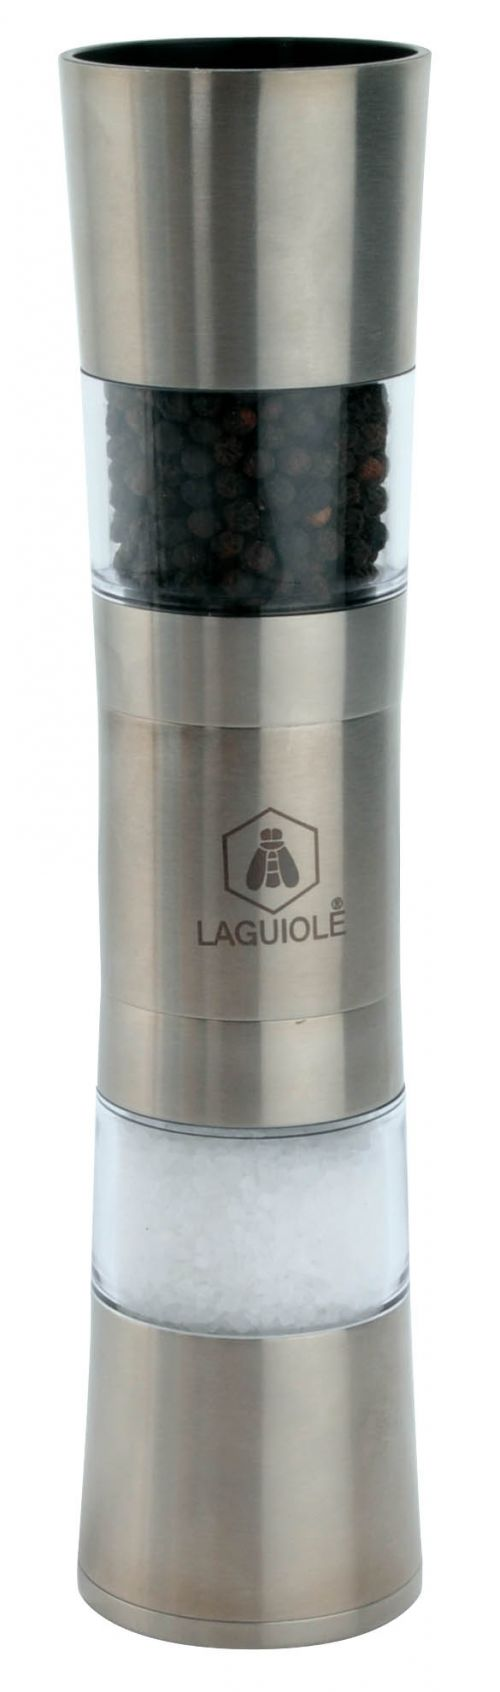 Laguiole Viala Salt och Pepparkvarn